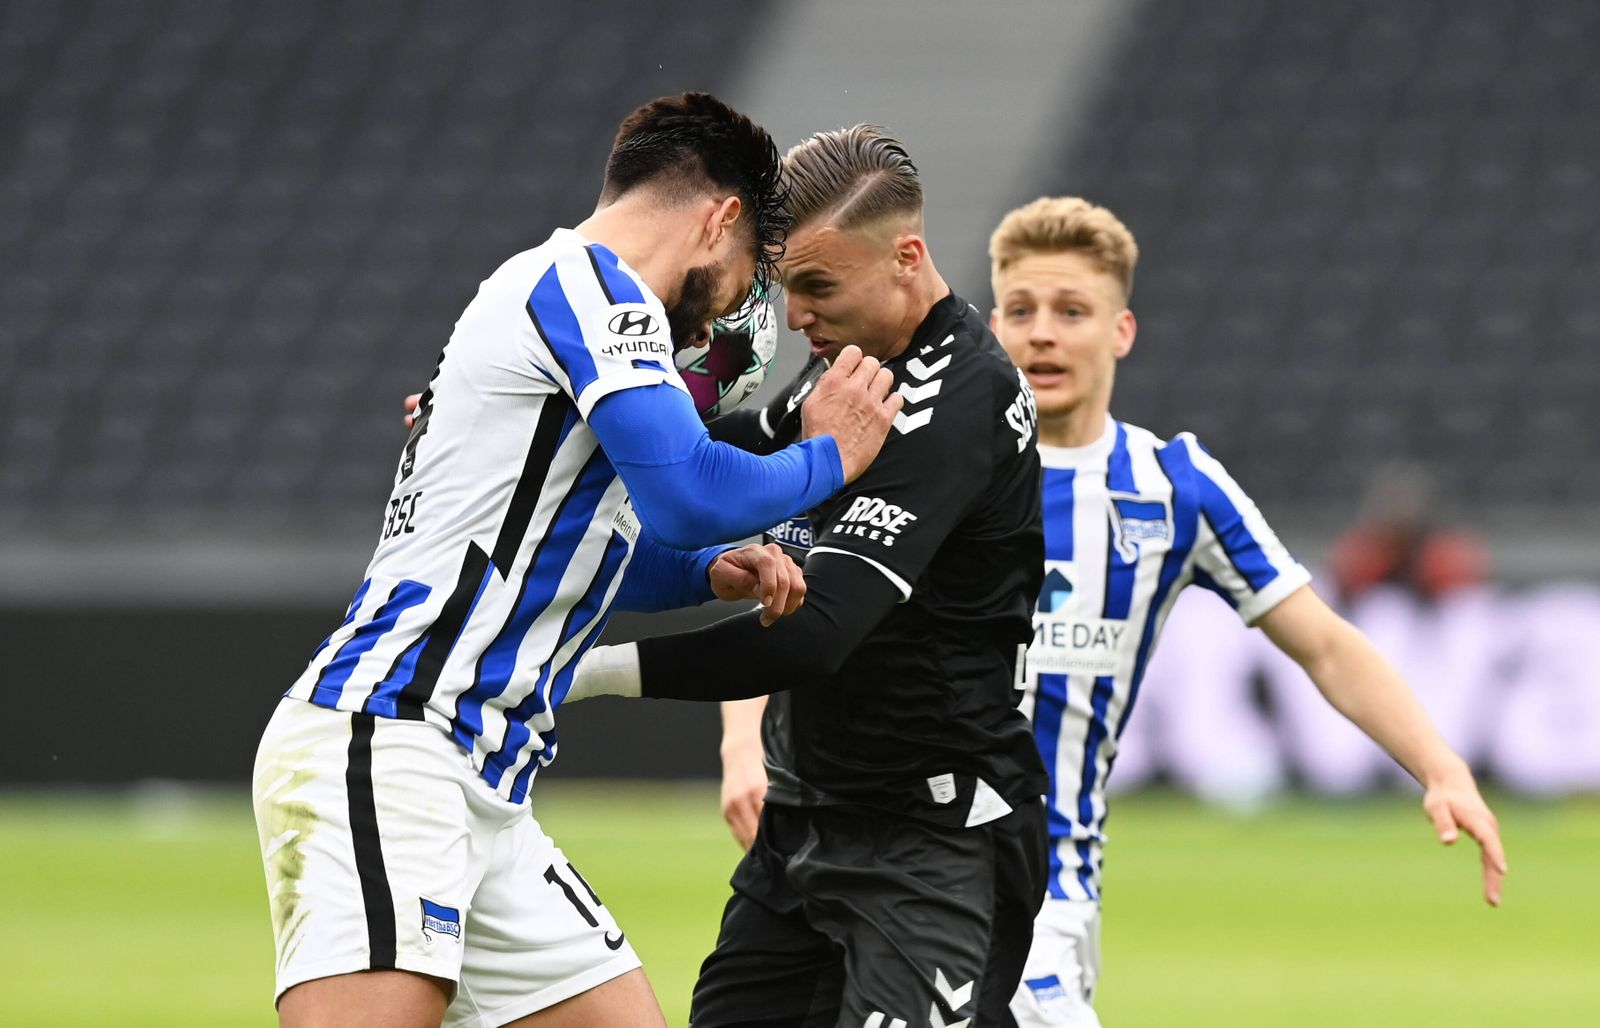 Fussball, Herren, 1. Bundesliga, Saison 2020/21, (30. Spieltag, Nachholspiel), Hertha BSC - SC Freiburg, v. l. Omar Ald